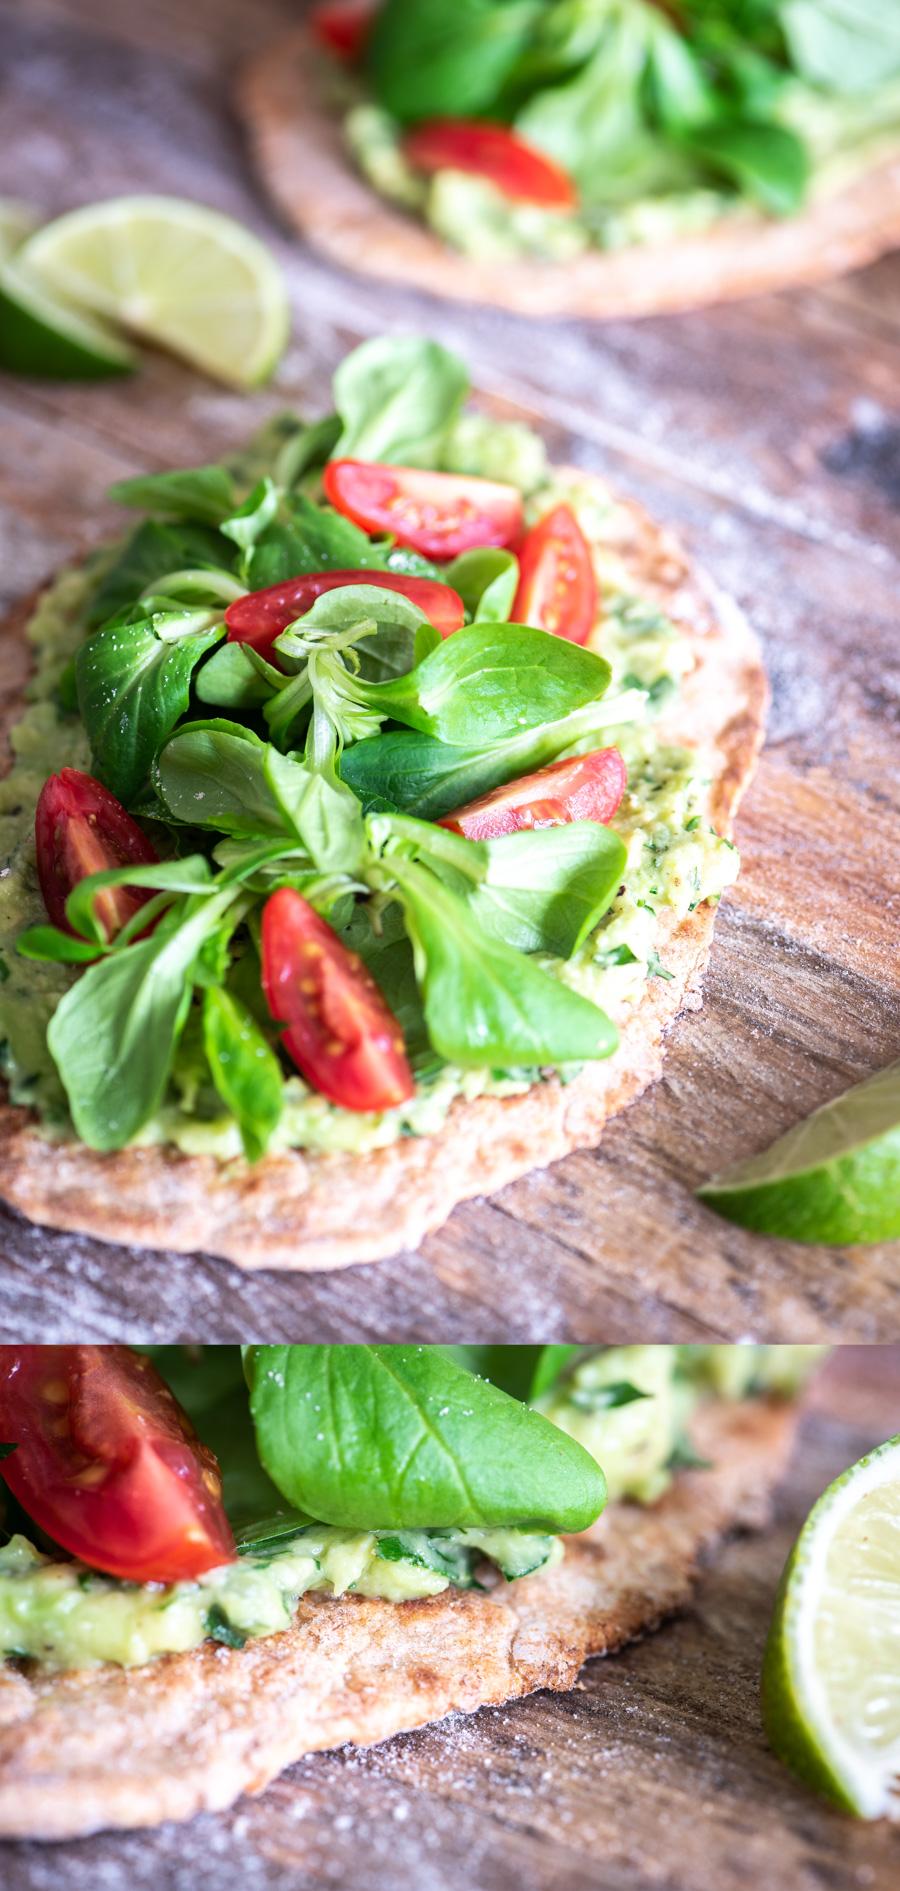 Yoghurtbrood Met Avocado Limoen Spread Voedzaam Snel